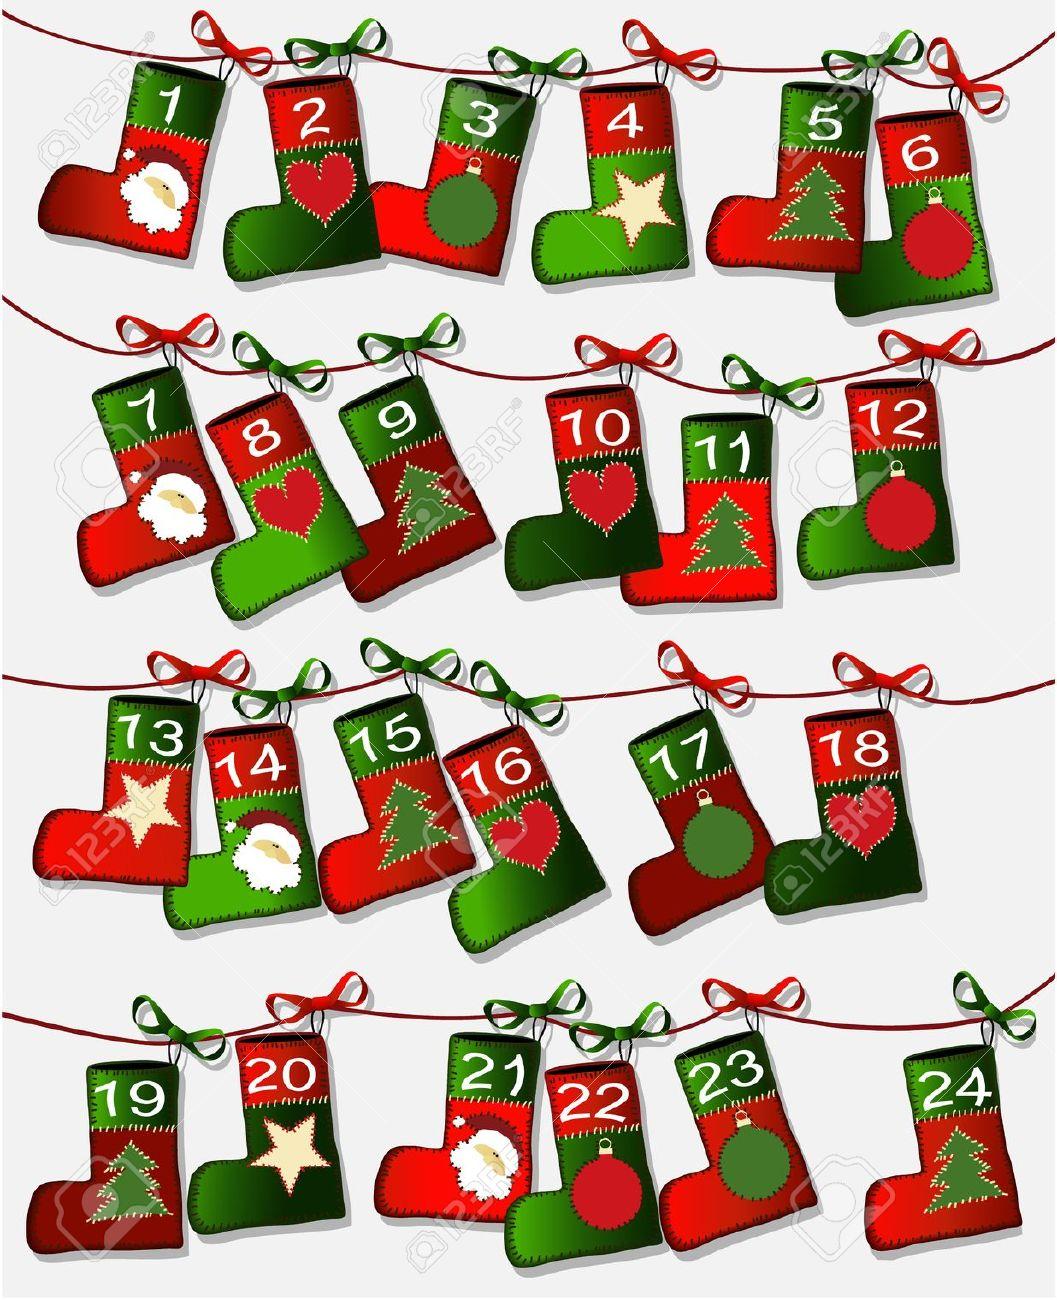 Advent calendar clipart free.